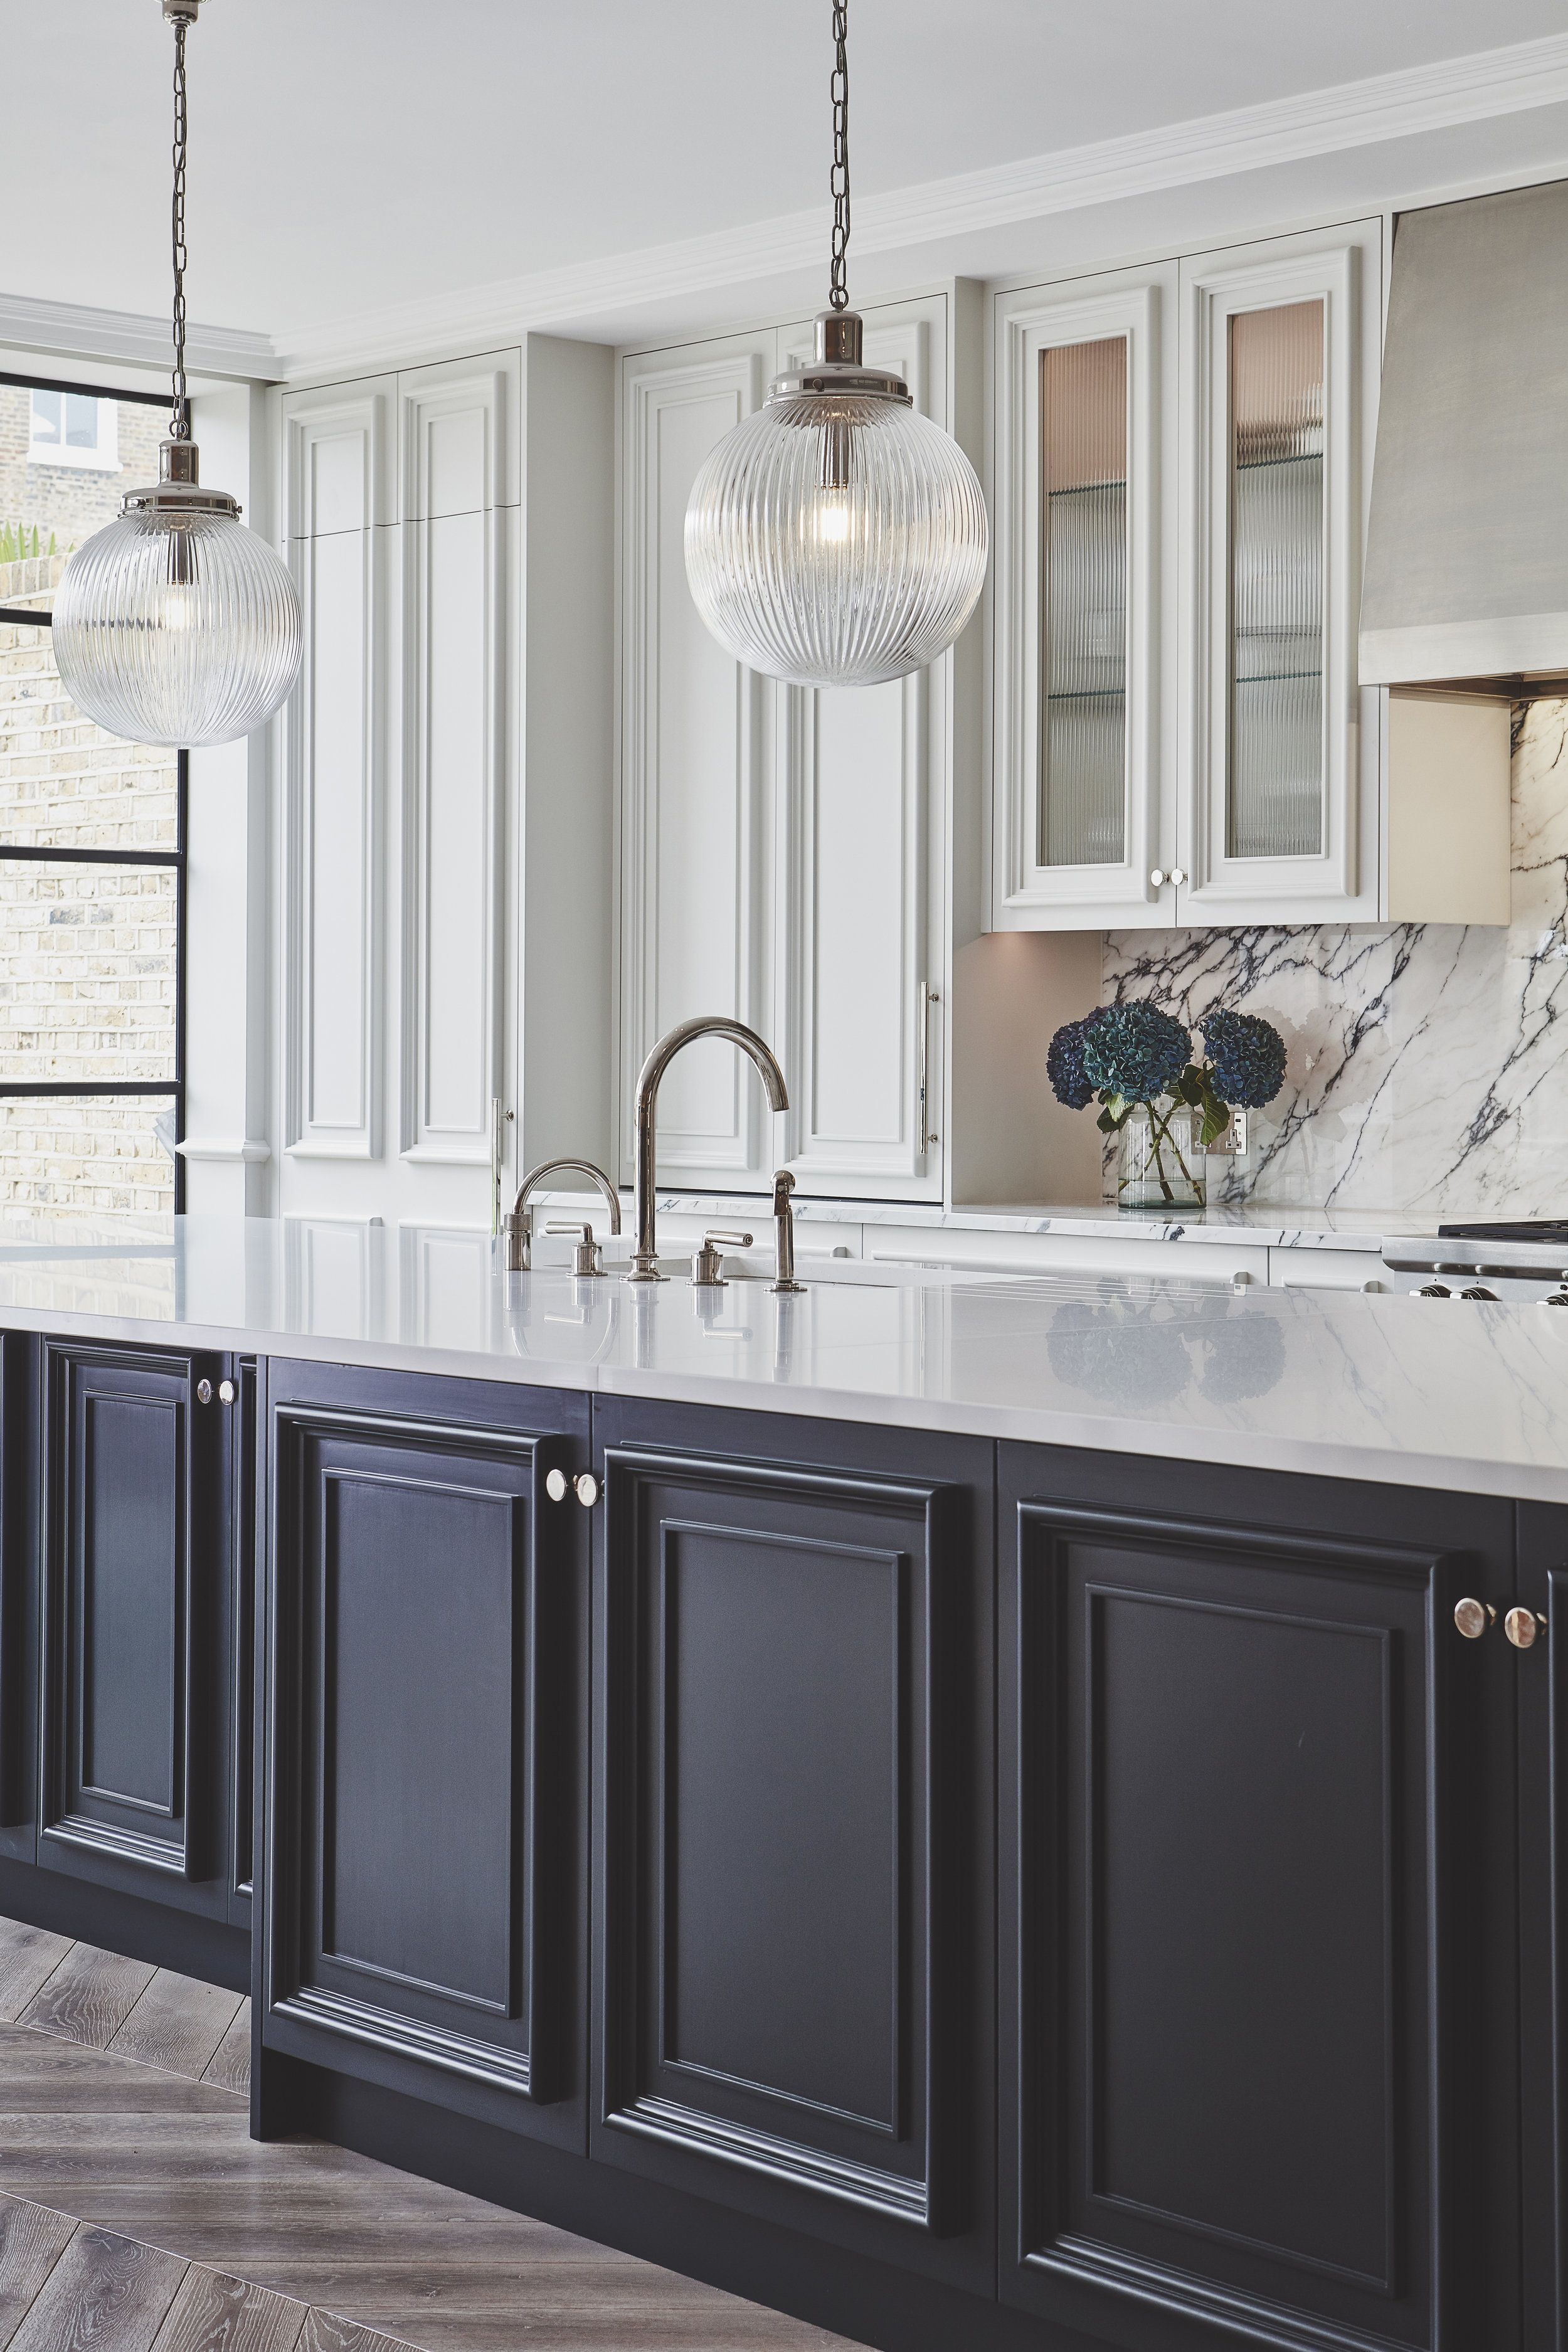 Sudbrooke Blakes London Glass Kitchen Cabinets Kitchen Design Glass Kitchen Cabinet Doors